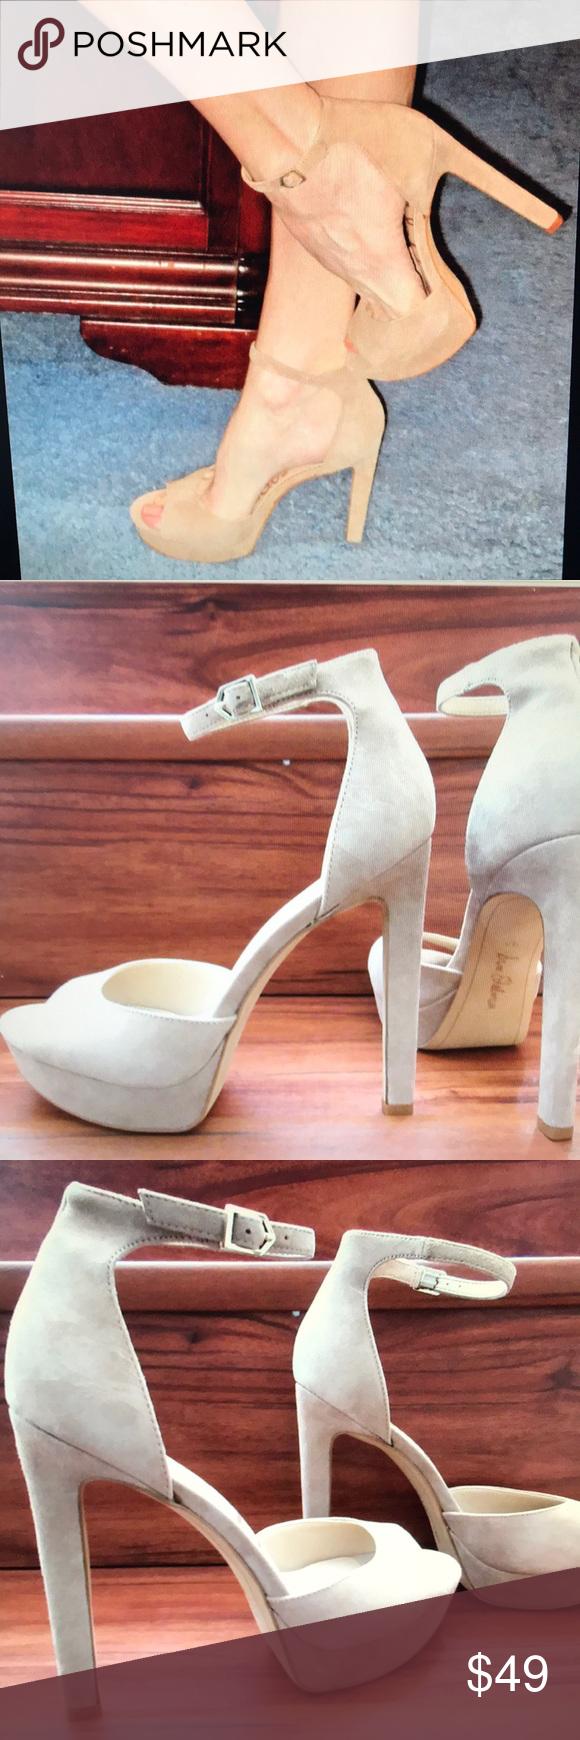 "bfa26c78888 SAM EDELMAN WALLACE SUEDE ANKLE STRAP SANDAL 9.5 New in box. 5.5"" heel with  1"" platform. Sam Edelman Shoes Heels"